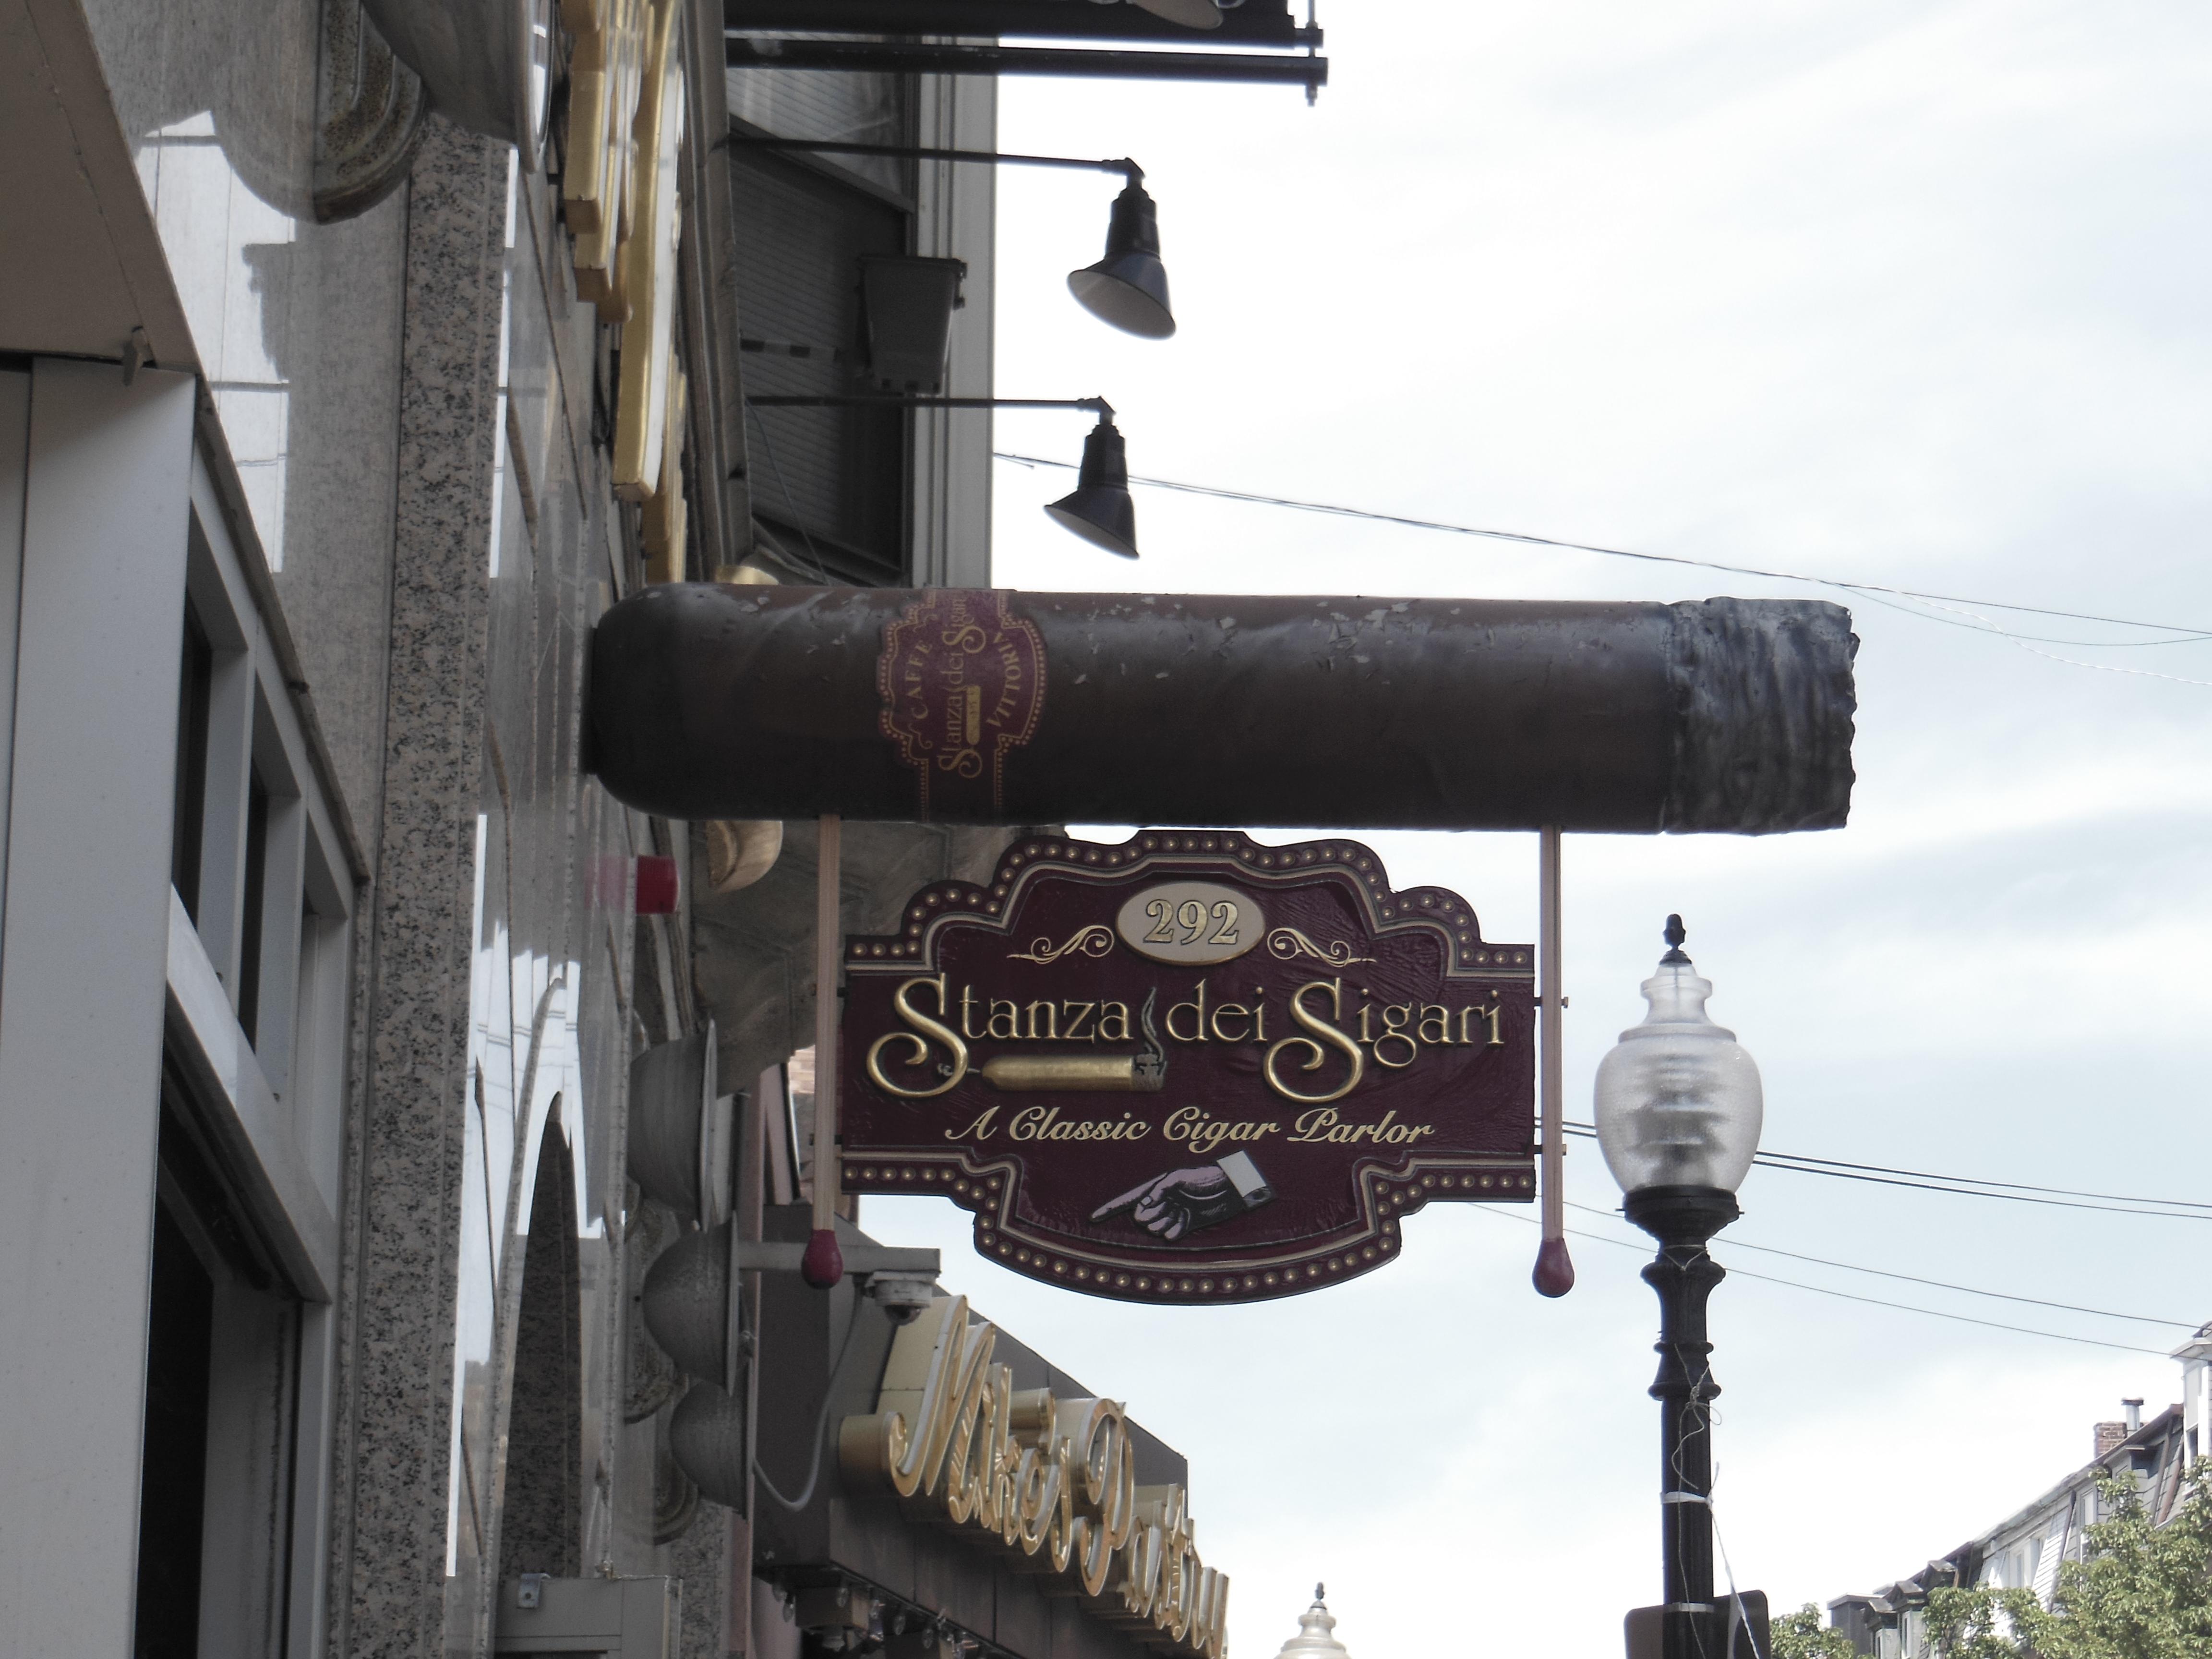 Stanza Dei Sigari History : English cigaresdr